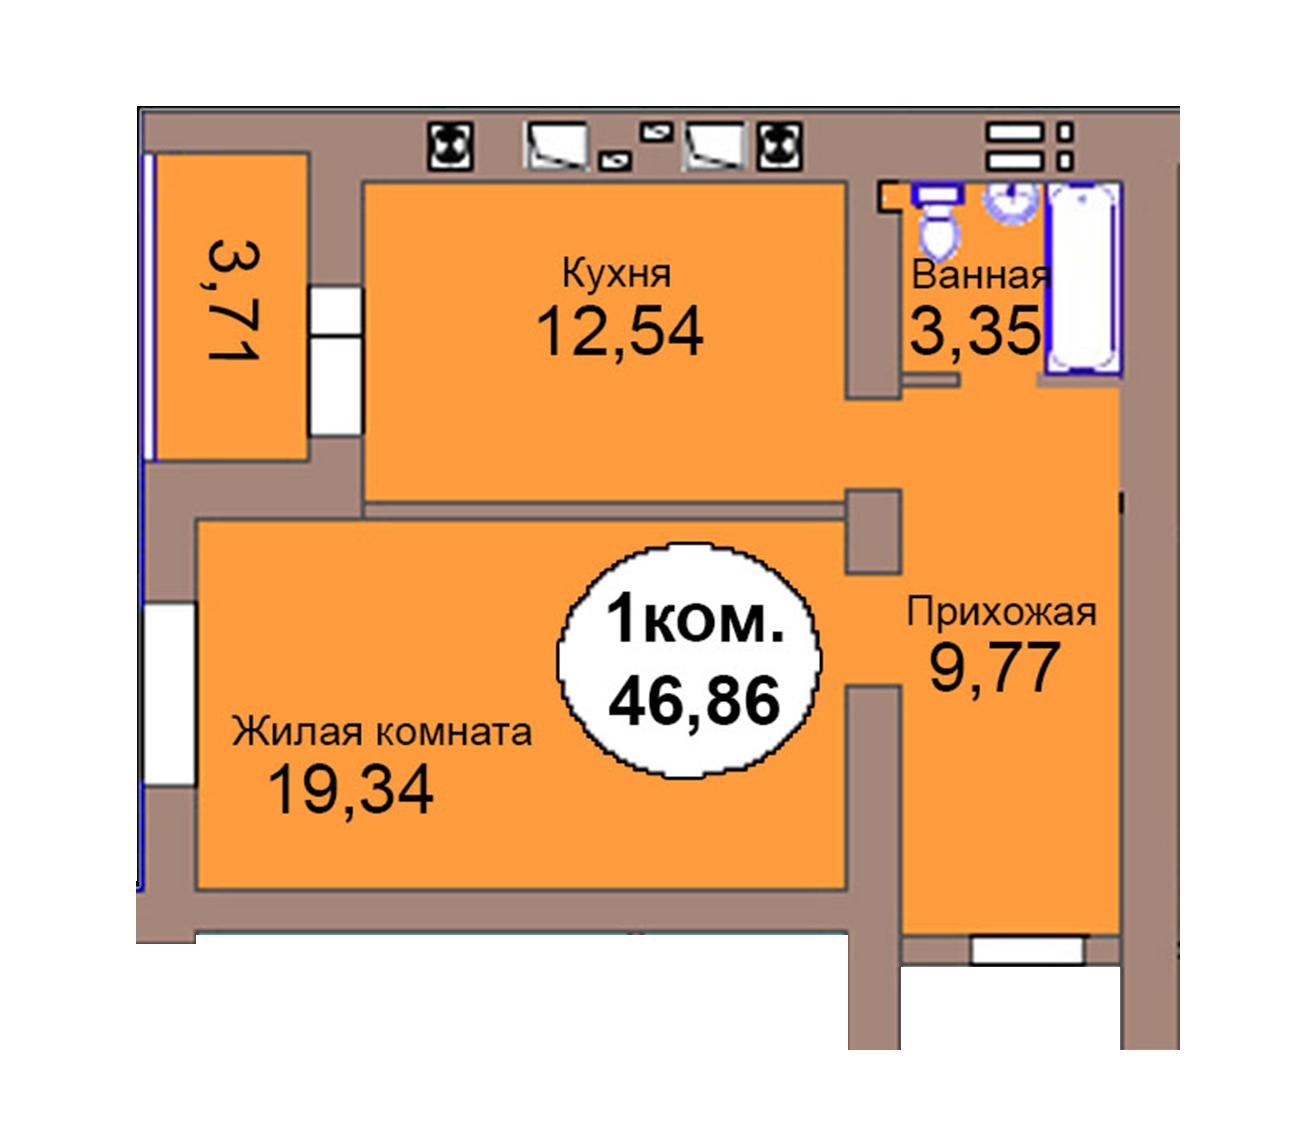 1-комн. кв. по пер. Калининградский, 4  кв. 89 в Калининграде